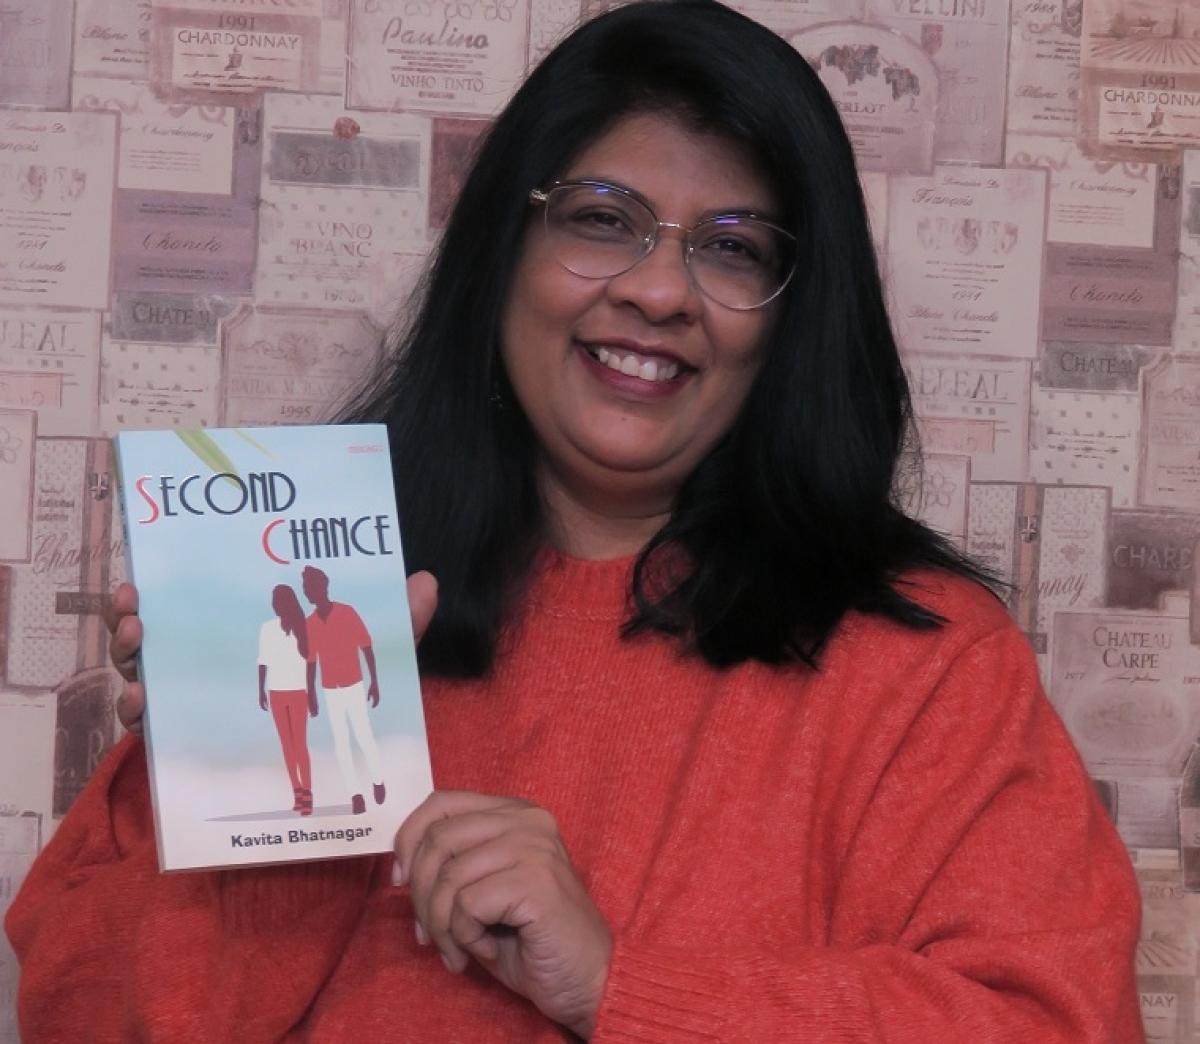 Kavita Bhatnagar